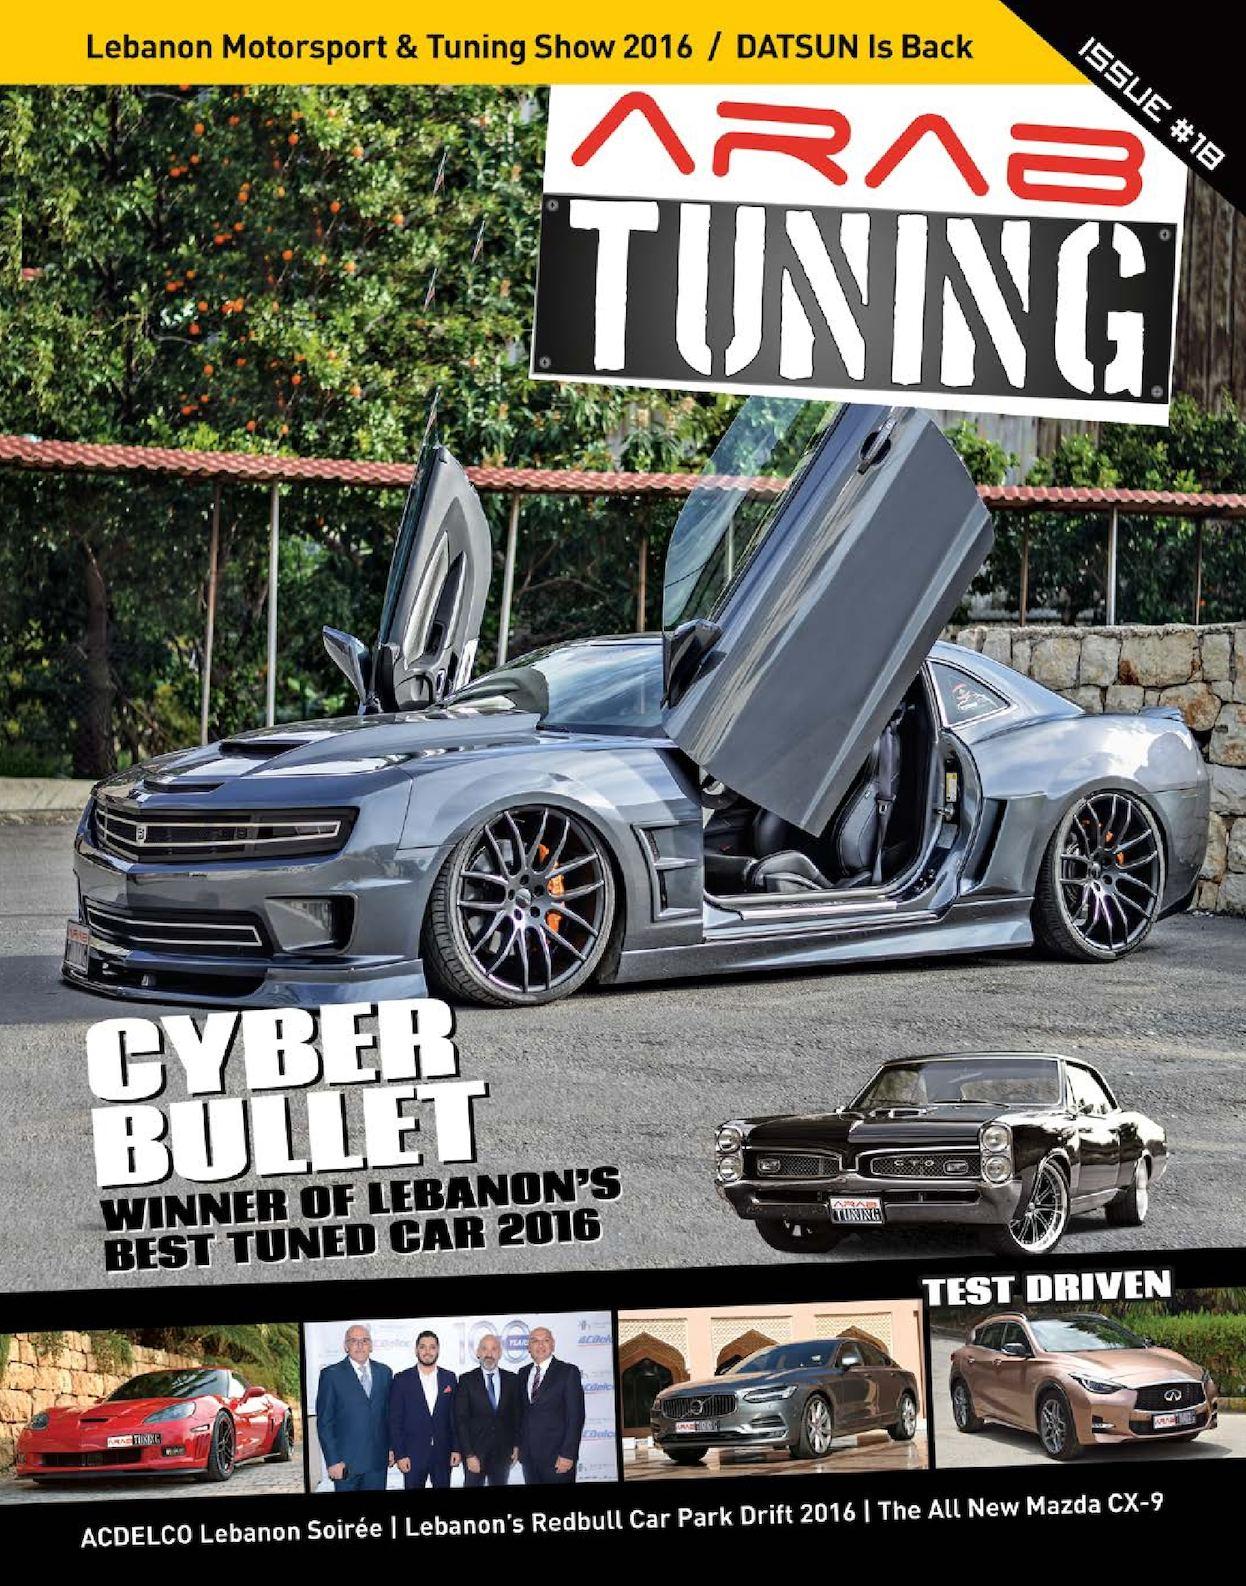 Calamo Arab Tuning Issue Magazine 18 Lebanon Edition 2004range Rover 4000 V8 Fuse Box Diagram